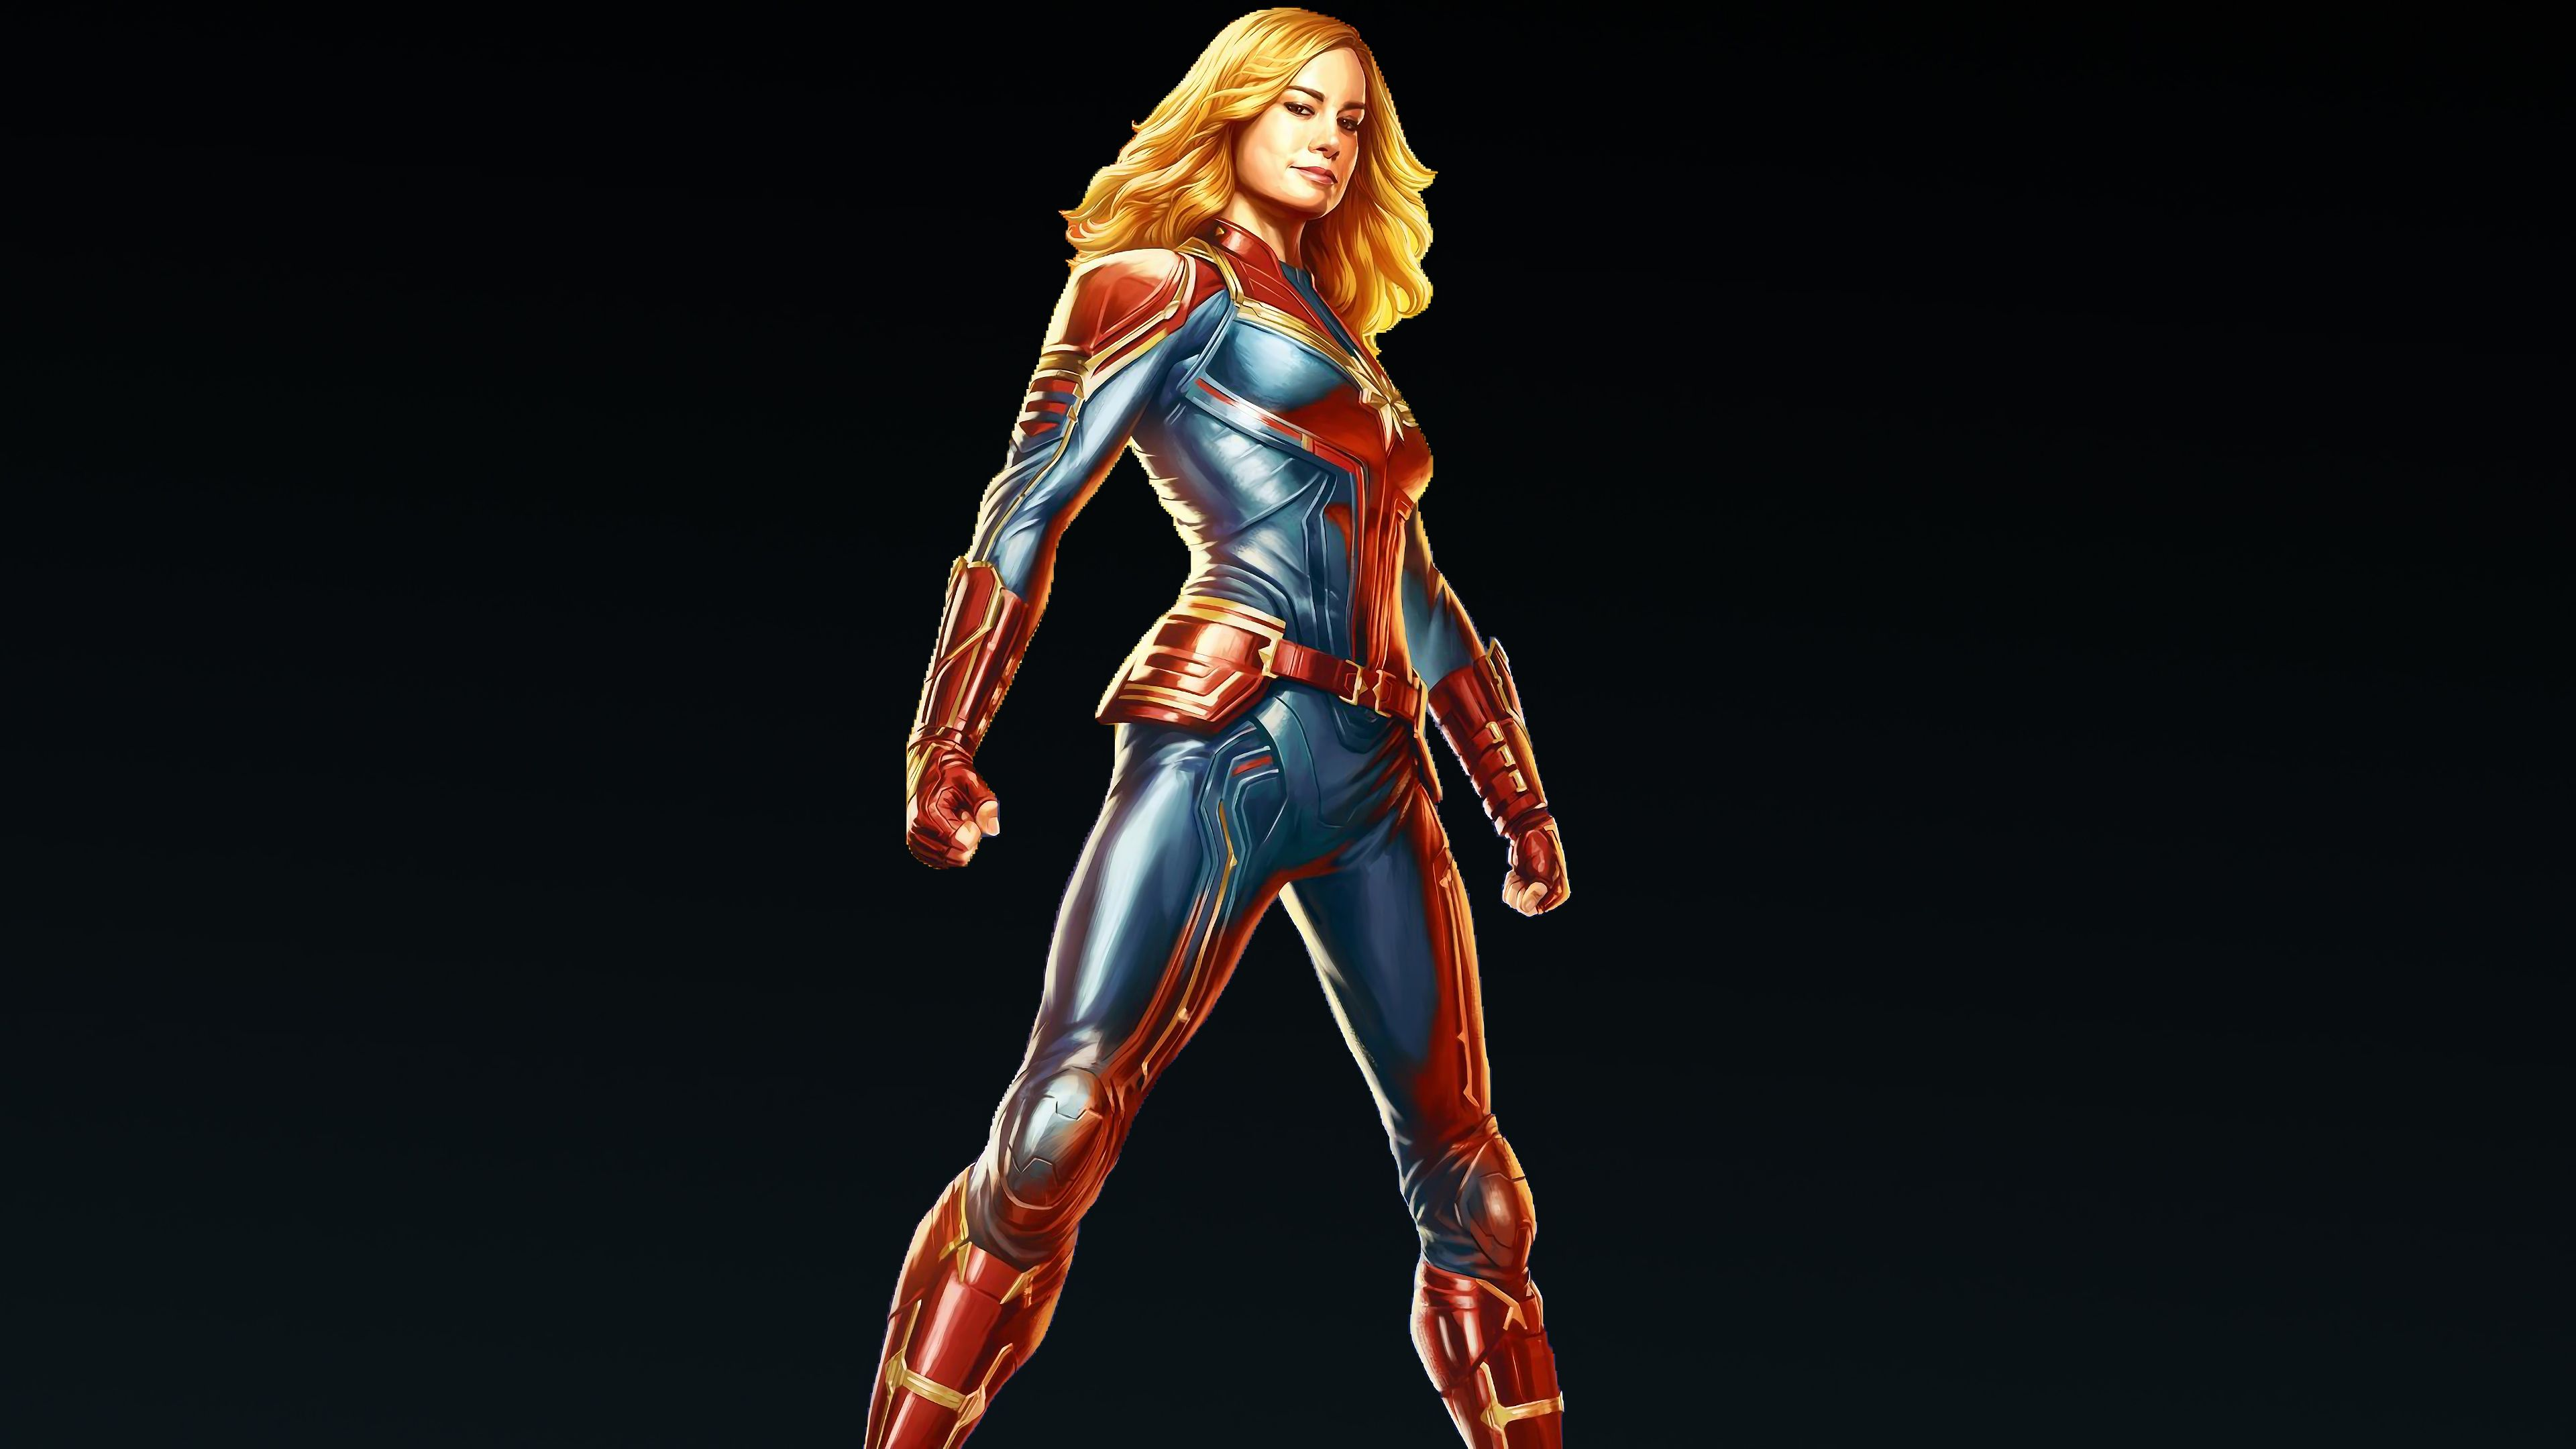 1280x2120 Pubg Game Girl Fanart Iphone 6 Hd 4k Wallpapers: 1280x2120 Captain Marvel Carol Danvers 4k IPhone 6+ HD 4k